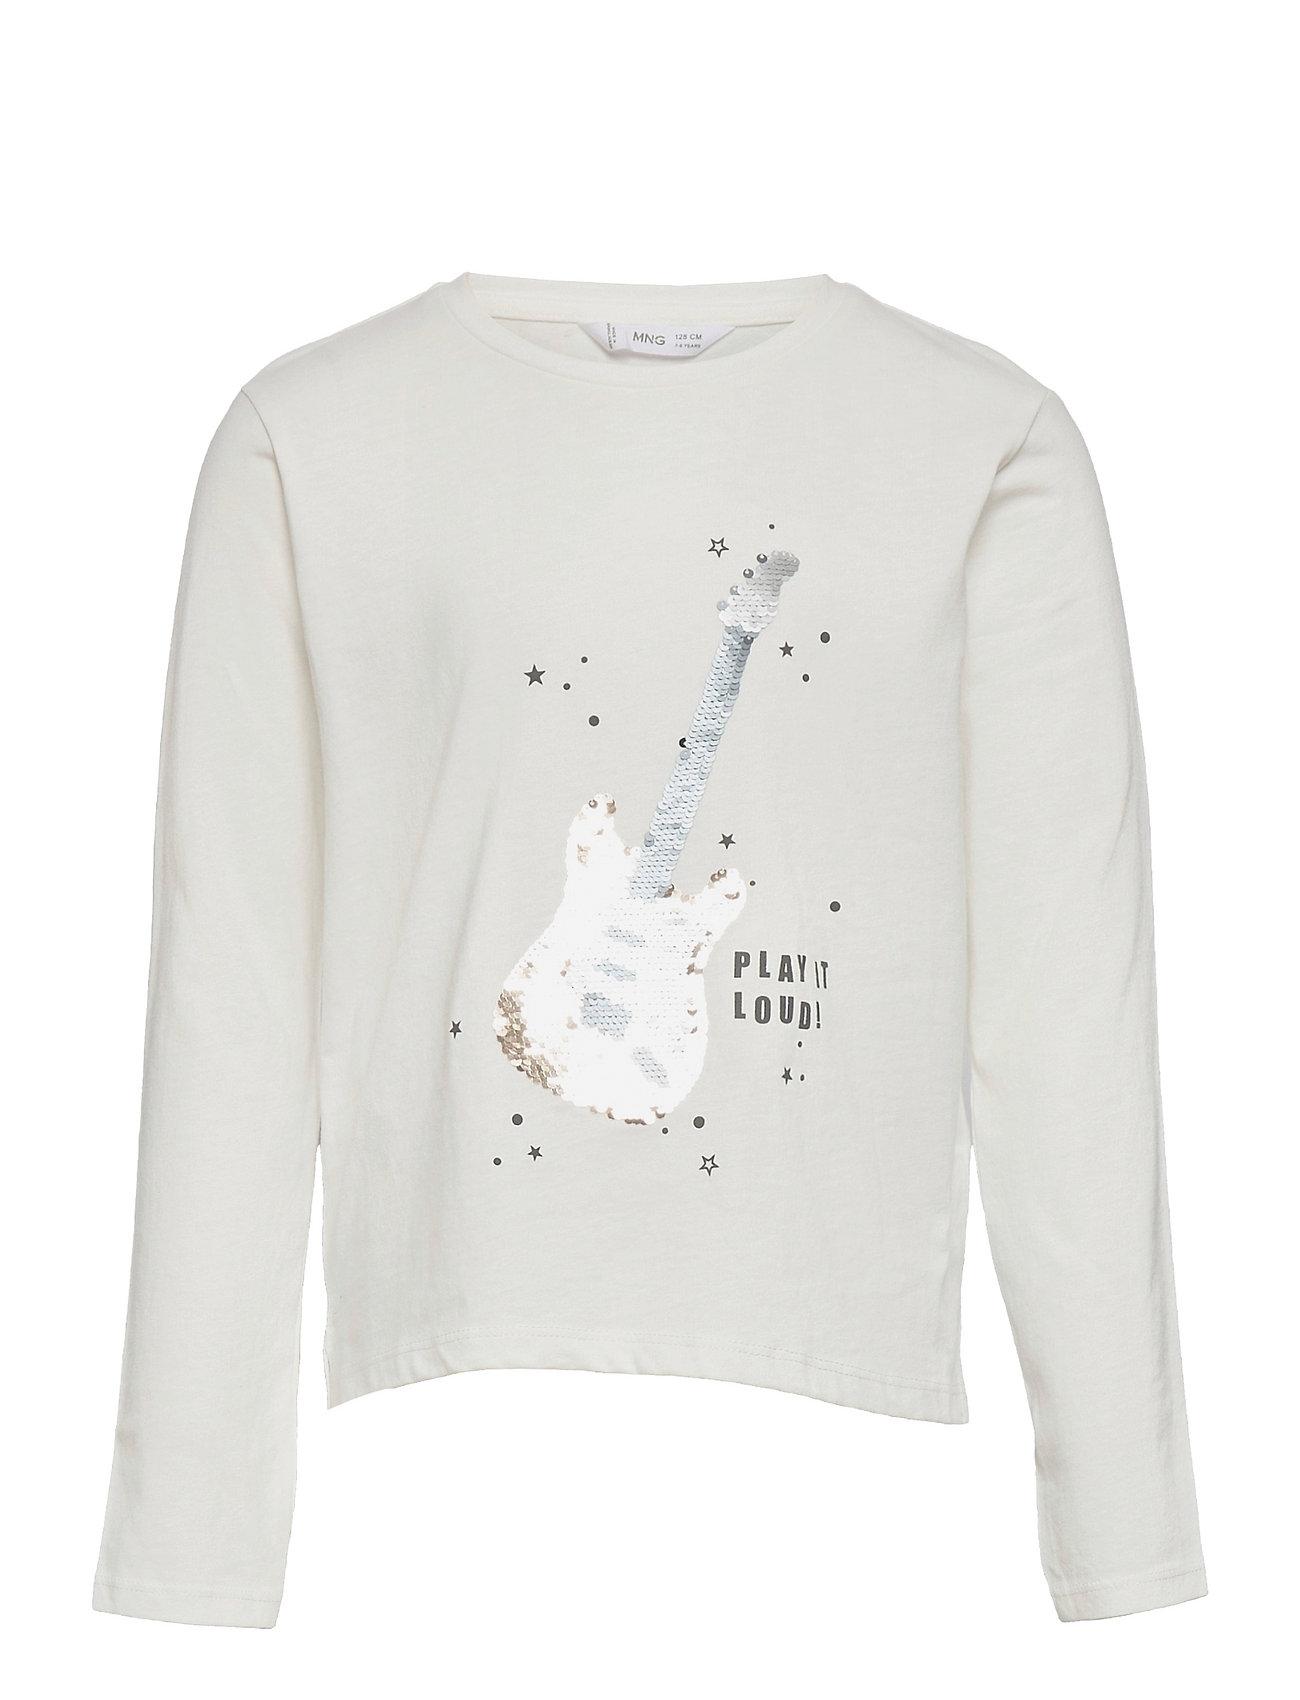 Lolly Langærmet T-shirt Hvid Mango